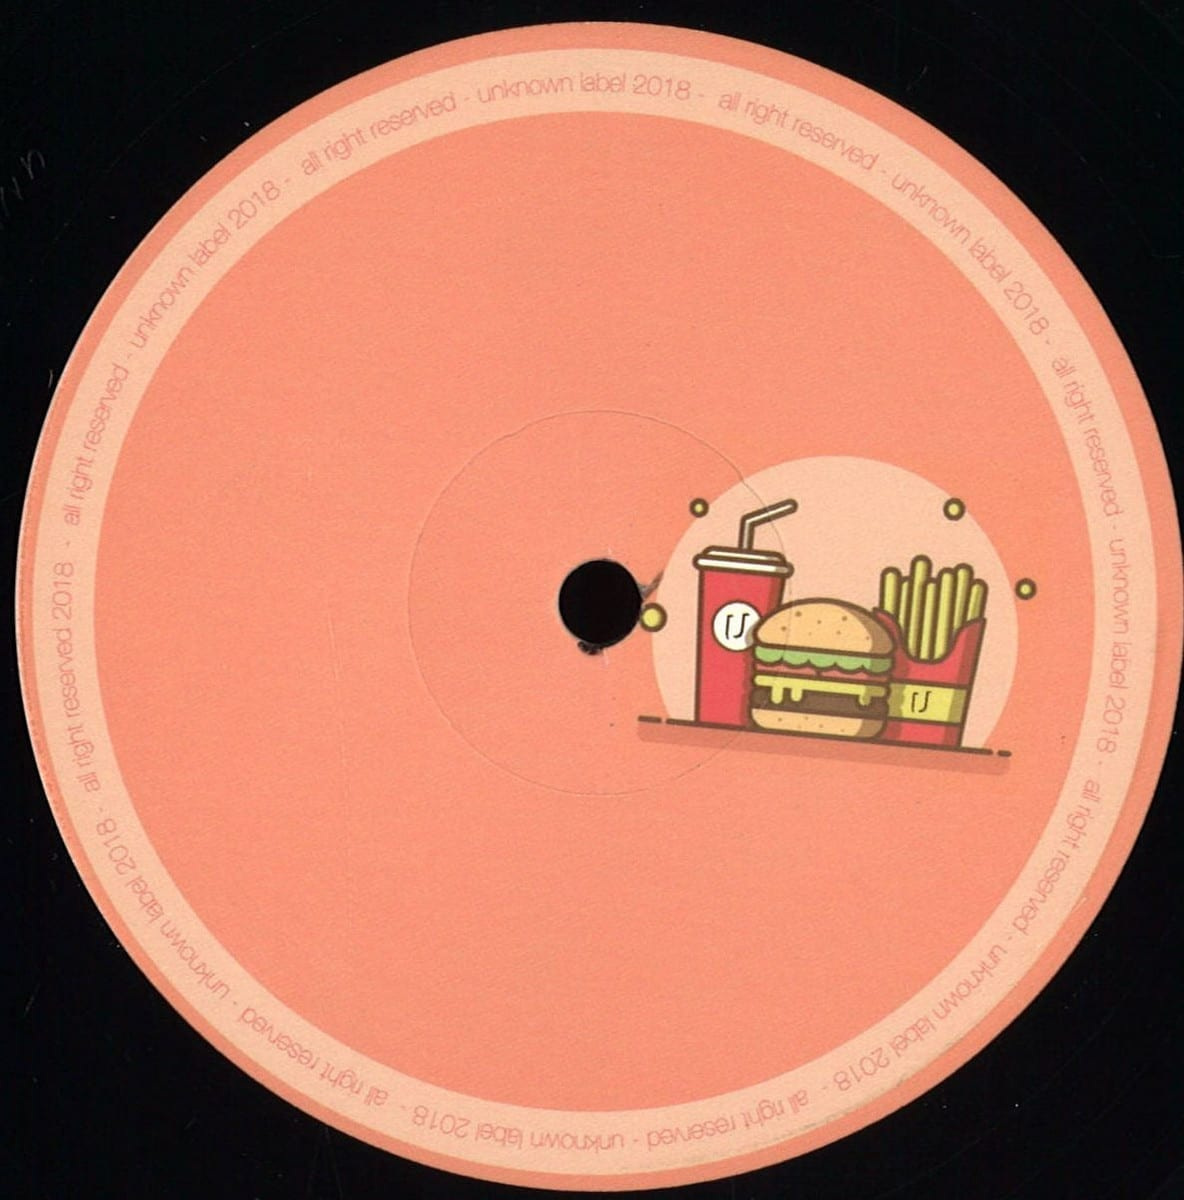 Fulvio Ruffert & Gregorio Serasin - 05 [Unknown Label]